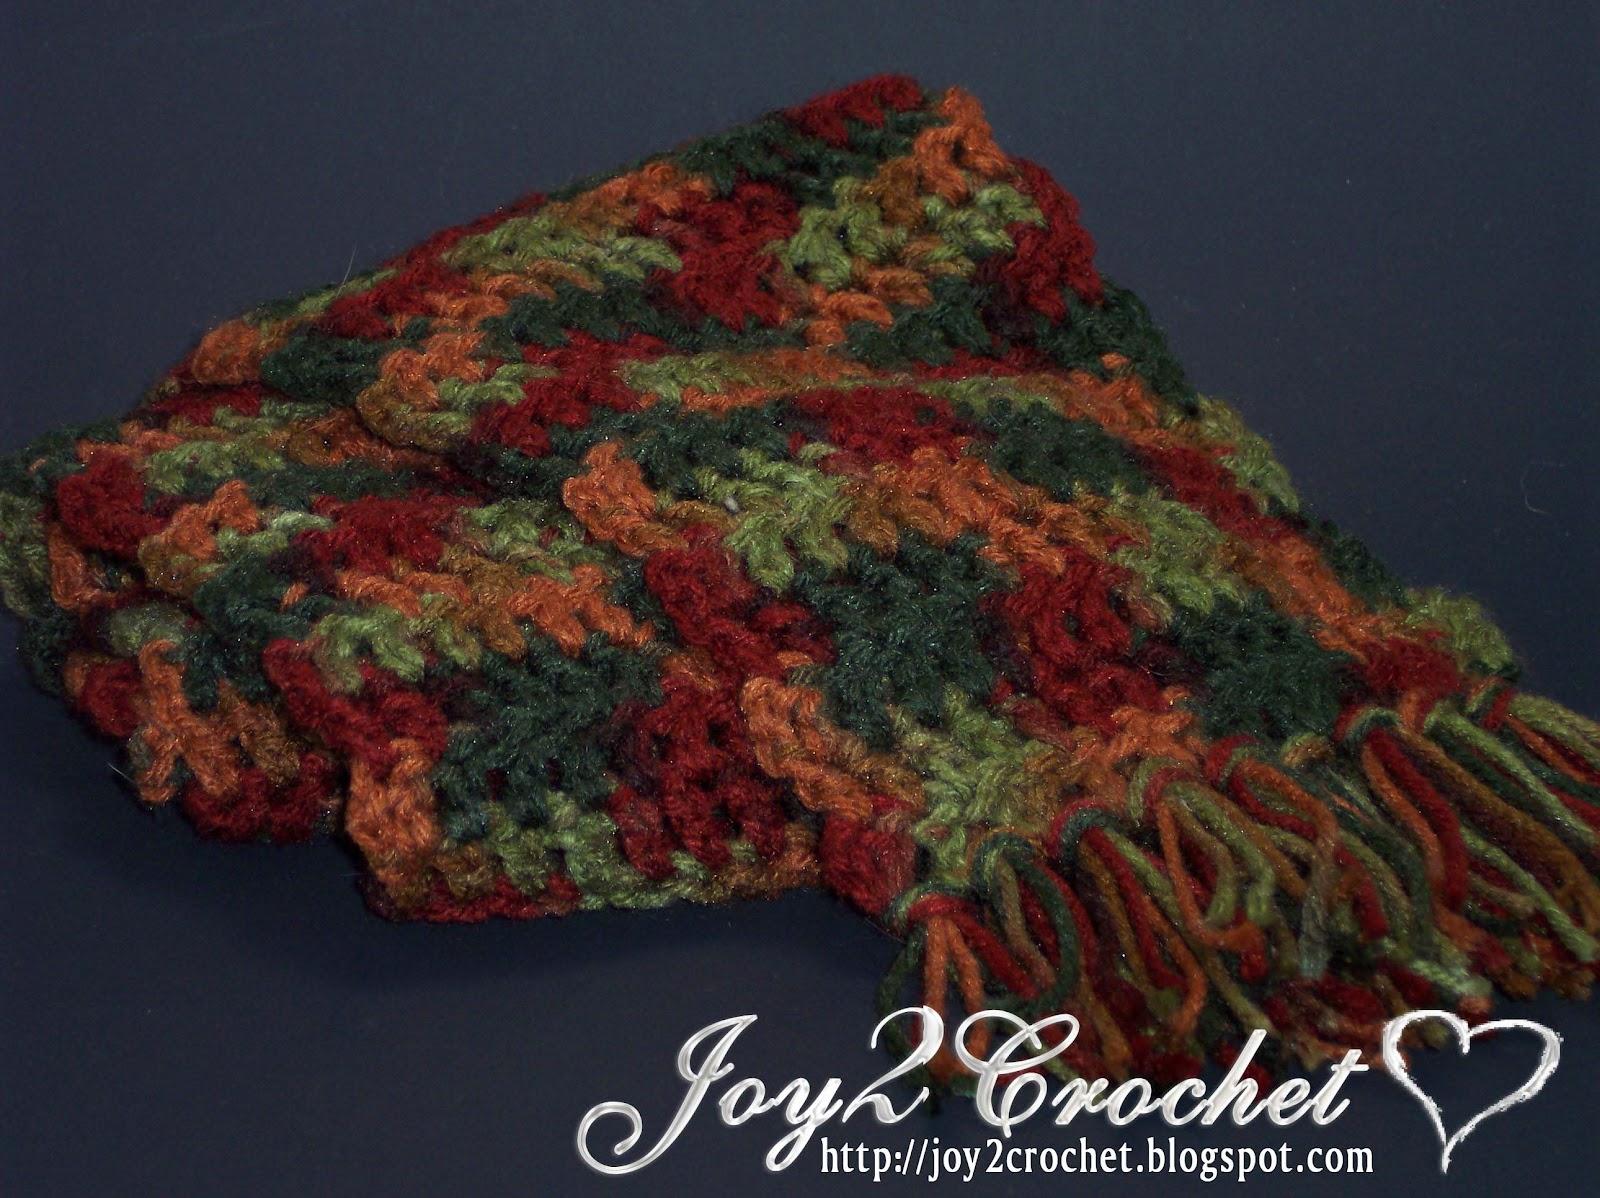 Variegated Yarn Crochet - Crochet Club